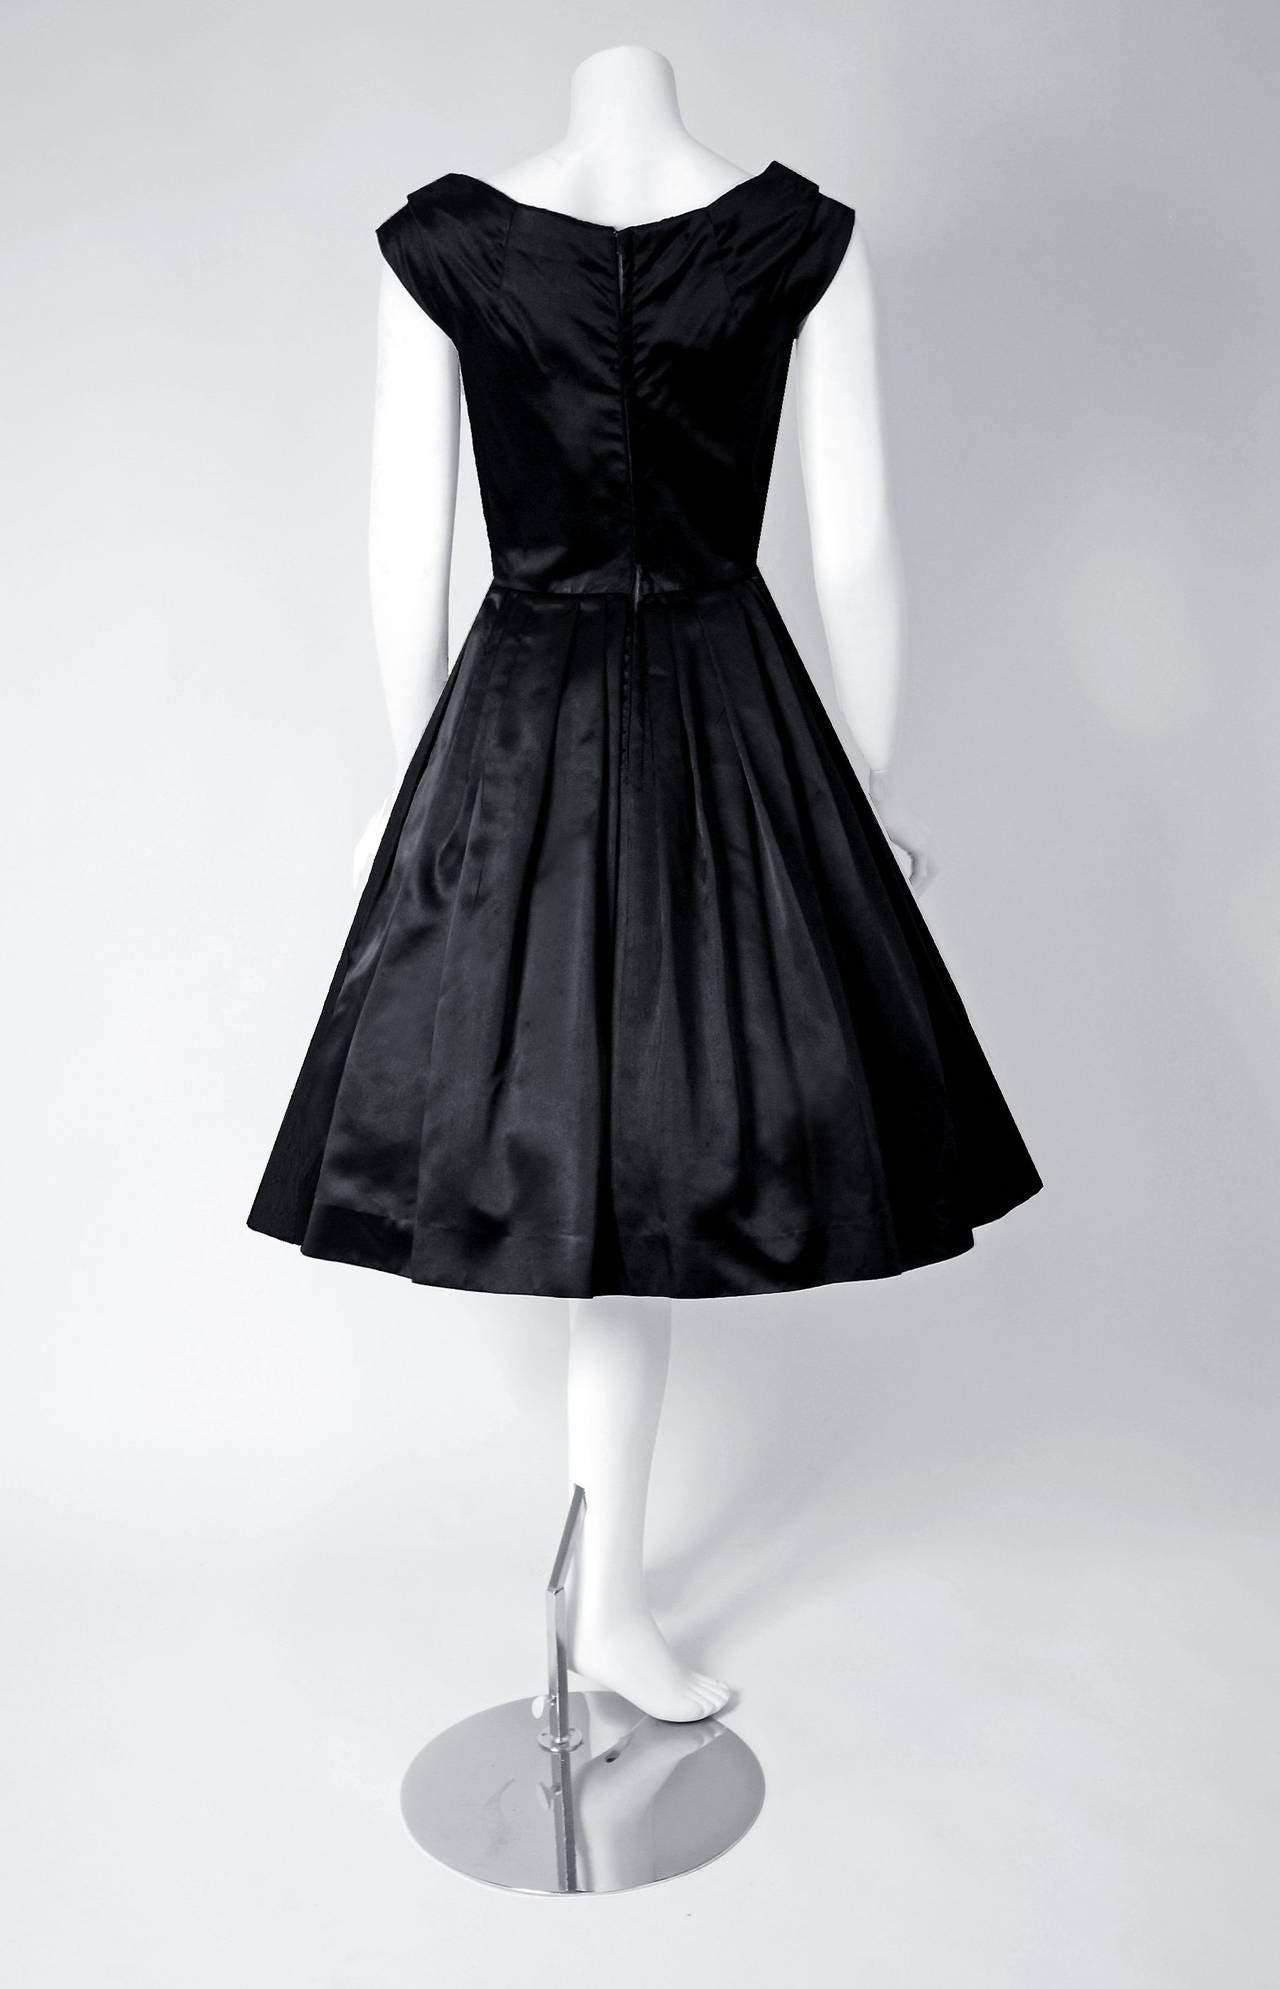 d4298f16a98 Black Dior Style Dresses